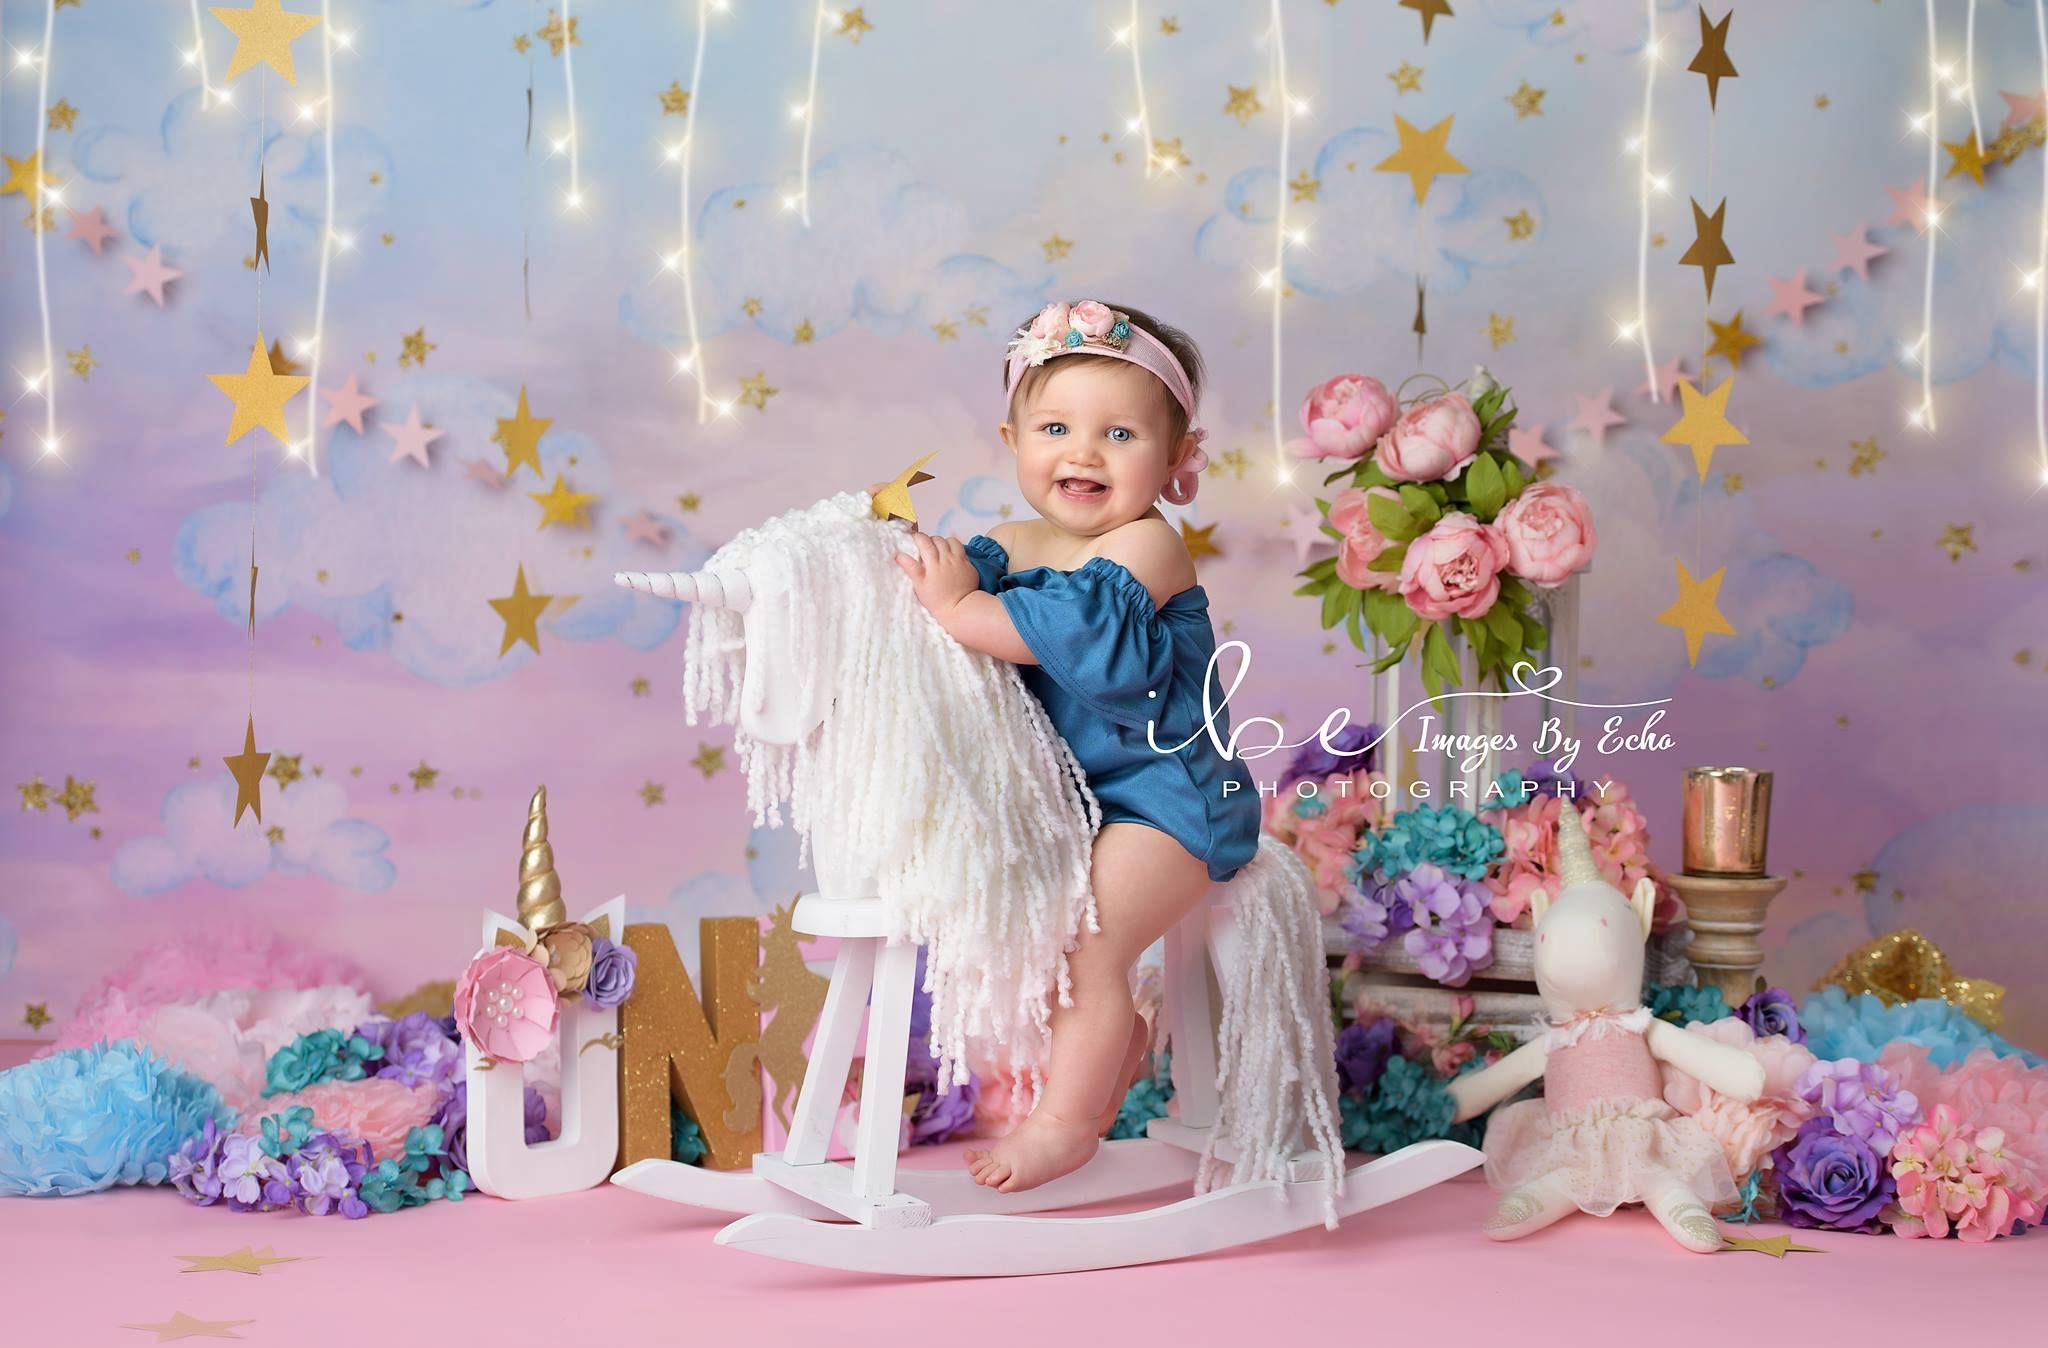 Ooozkken Animated Dream Background Theme Newborn Indoor Photography Studio Photography 8x12ft